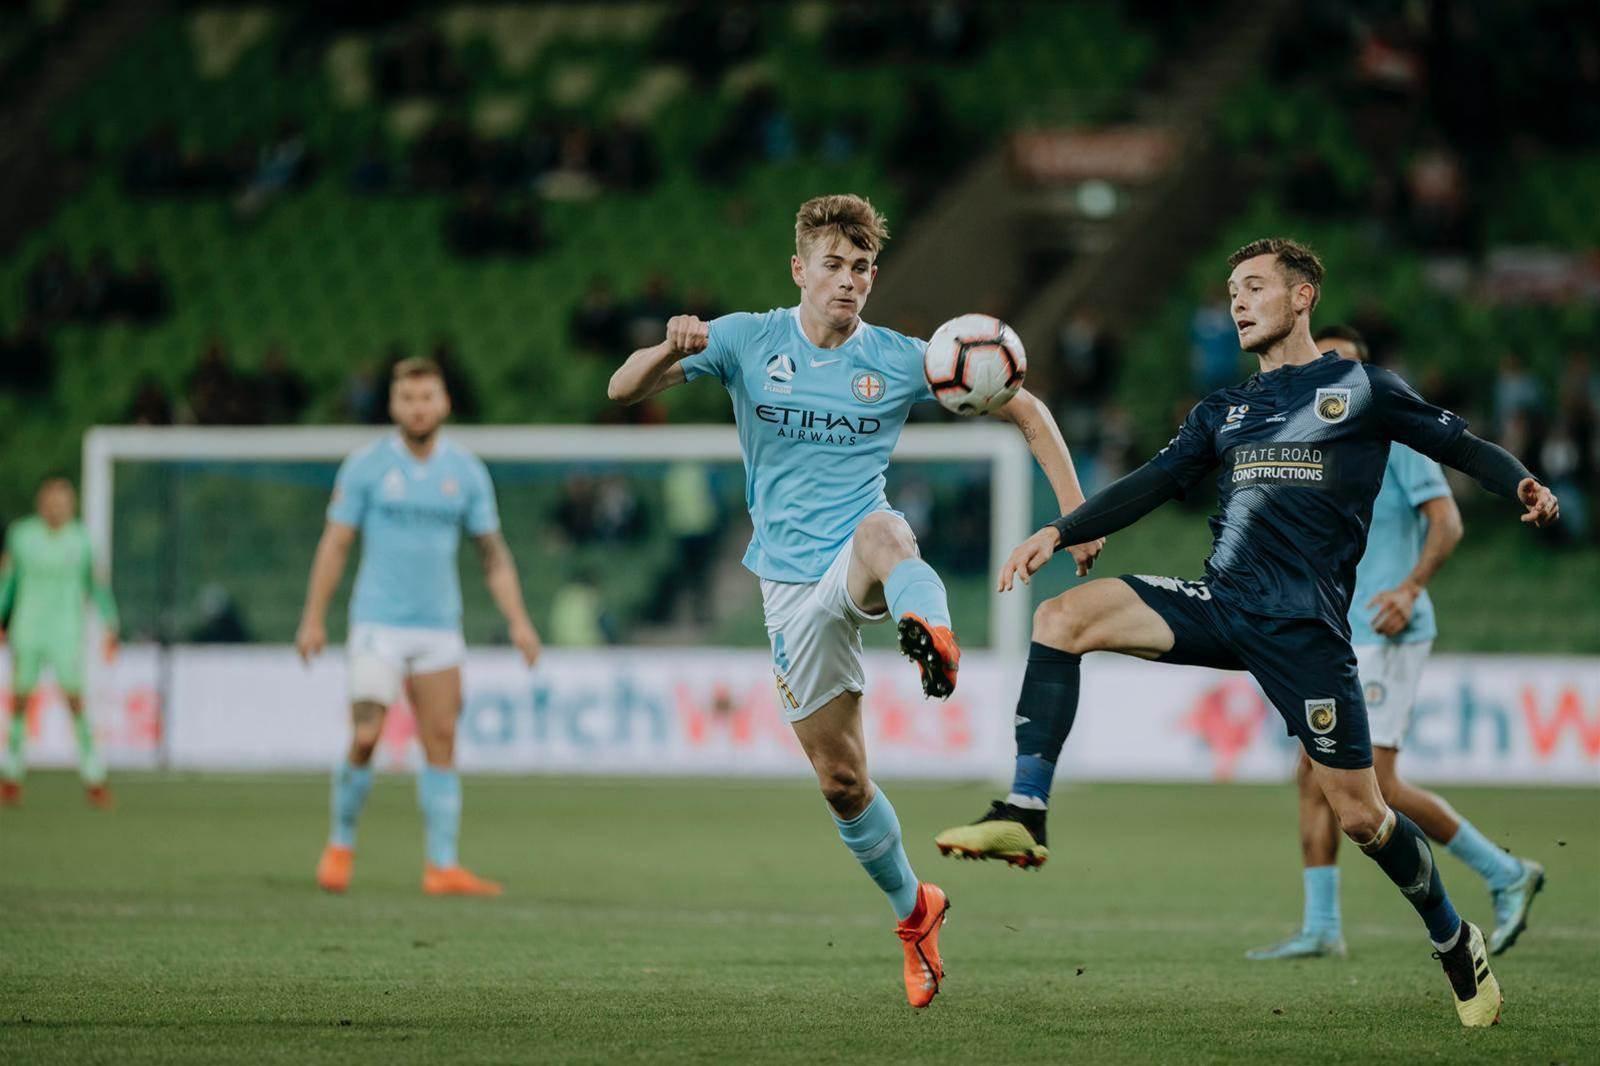 How City's rising star Metcalfe slipped through Jets' net